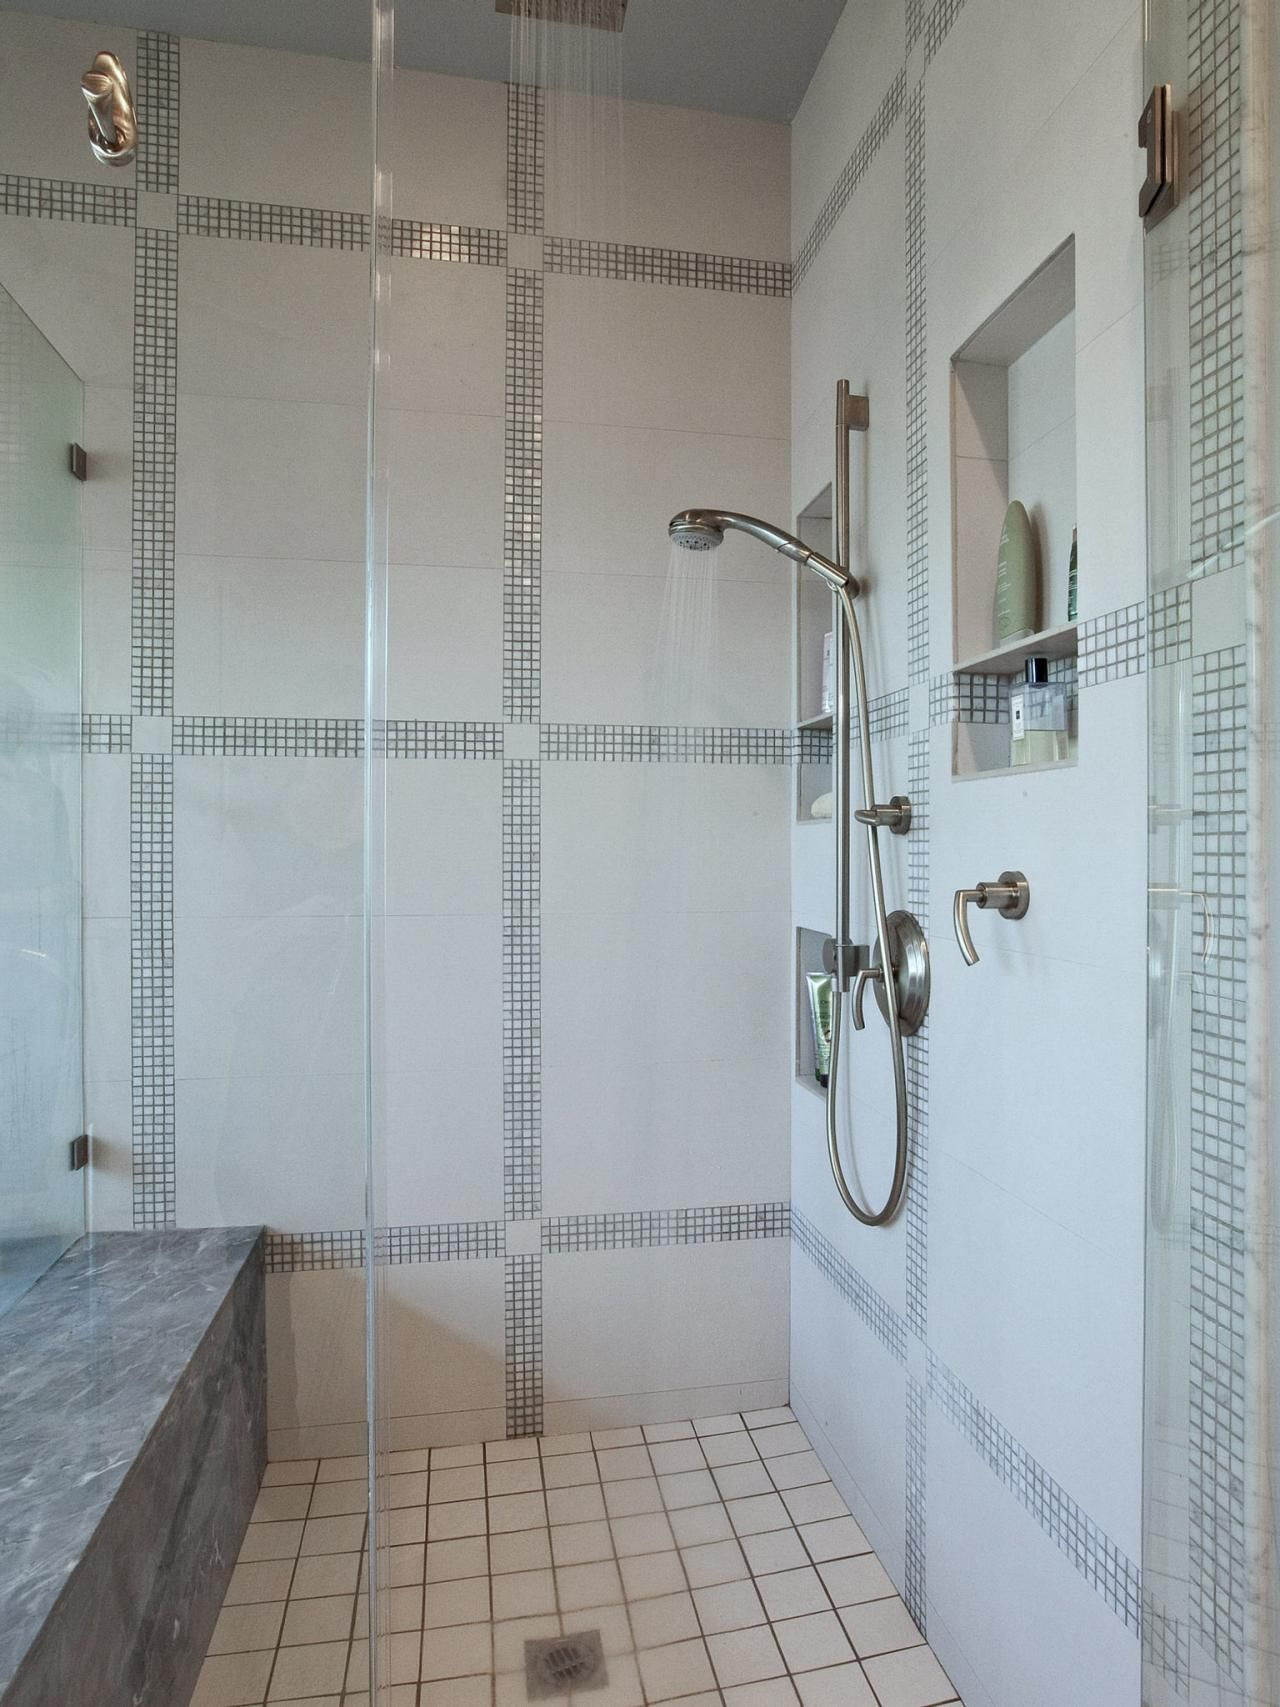 This simple but elegant modern bathroom shower features a rainshower ...